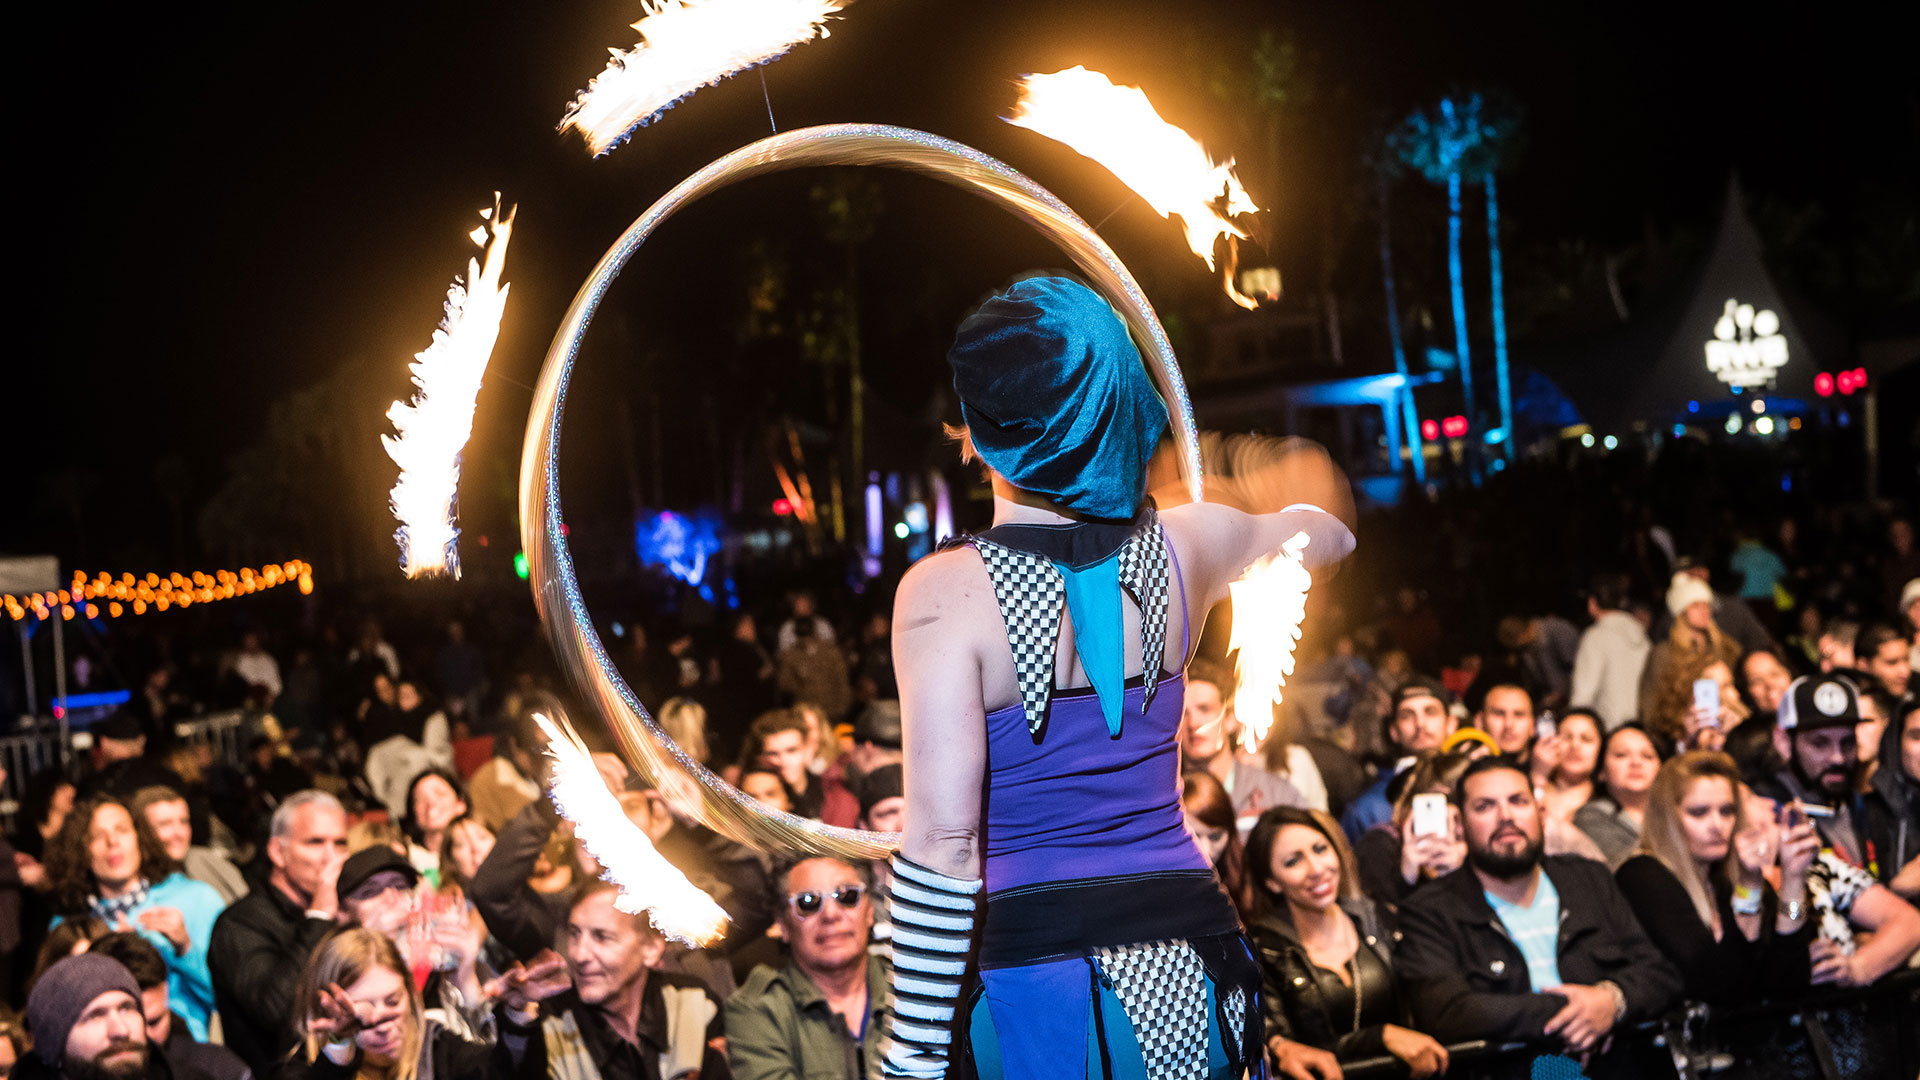 desert oasis music festival circus performers